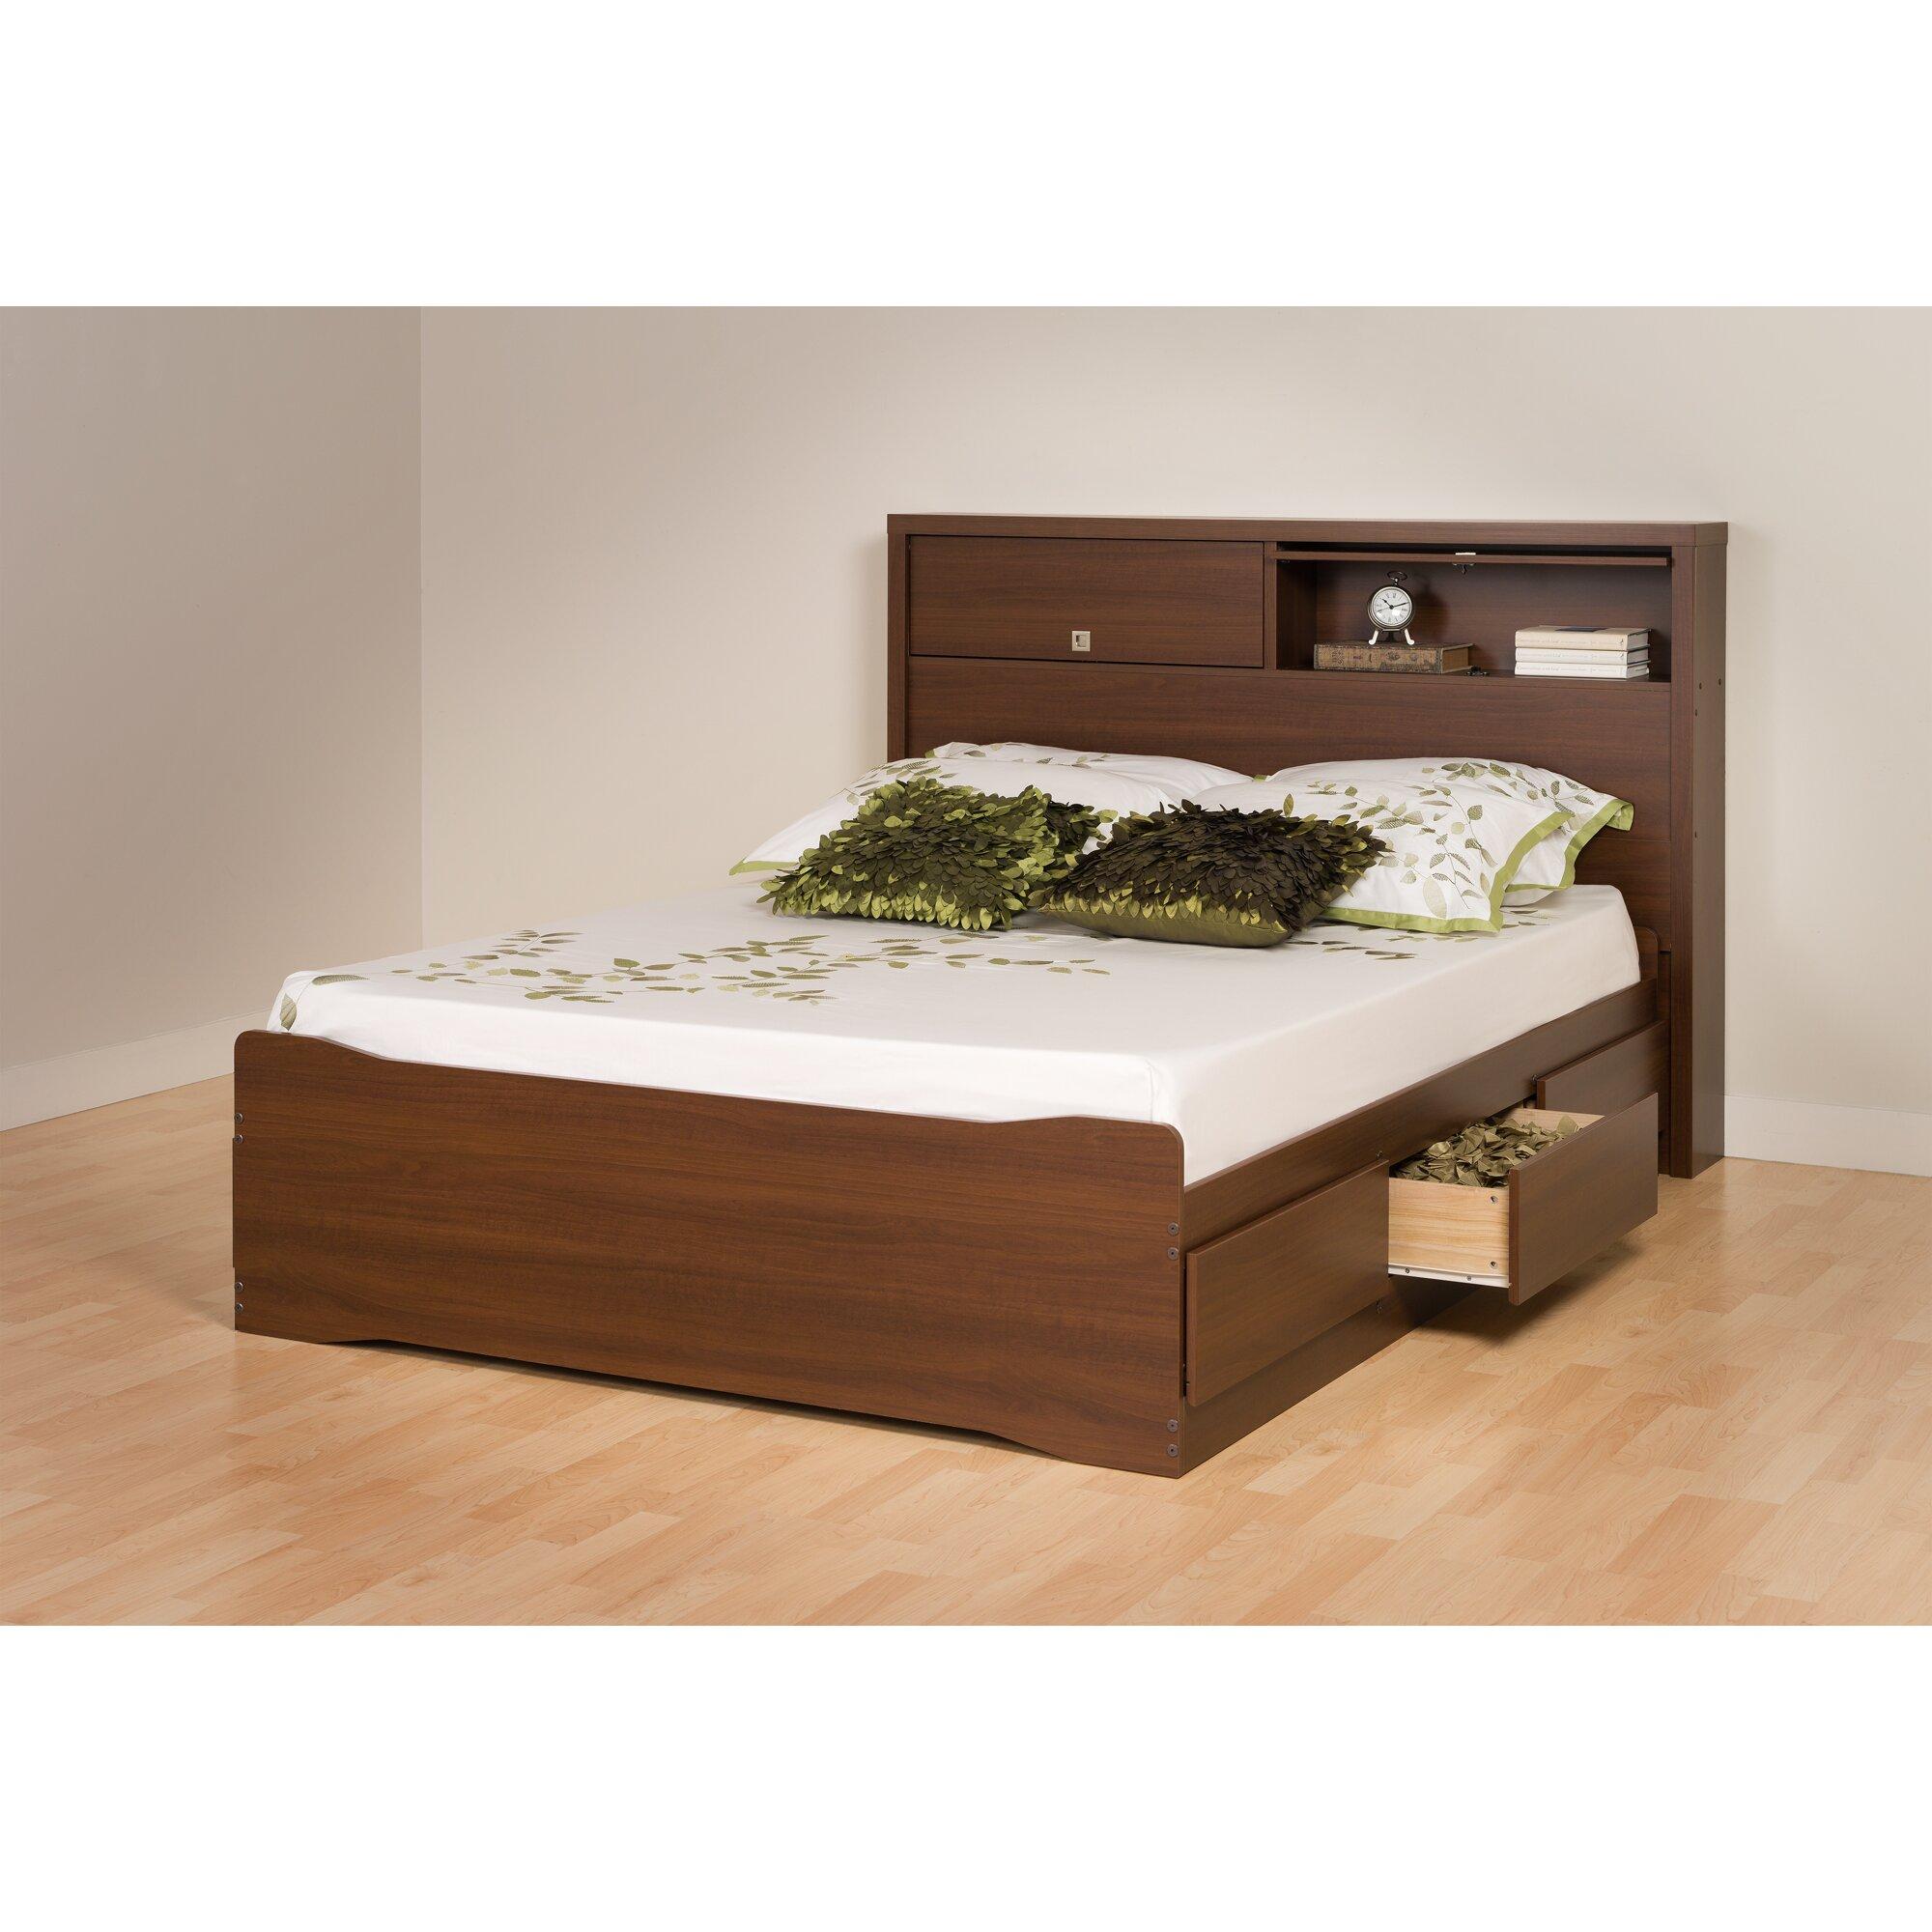 Prepac Bedroom Furniture Prepac Coal Harbor Storage Platform Bed Reviews Wayfair